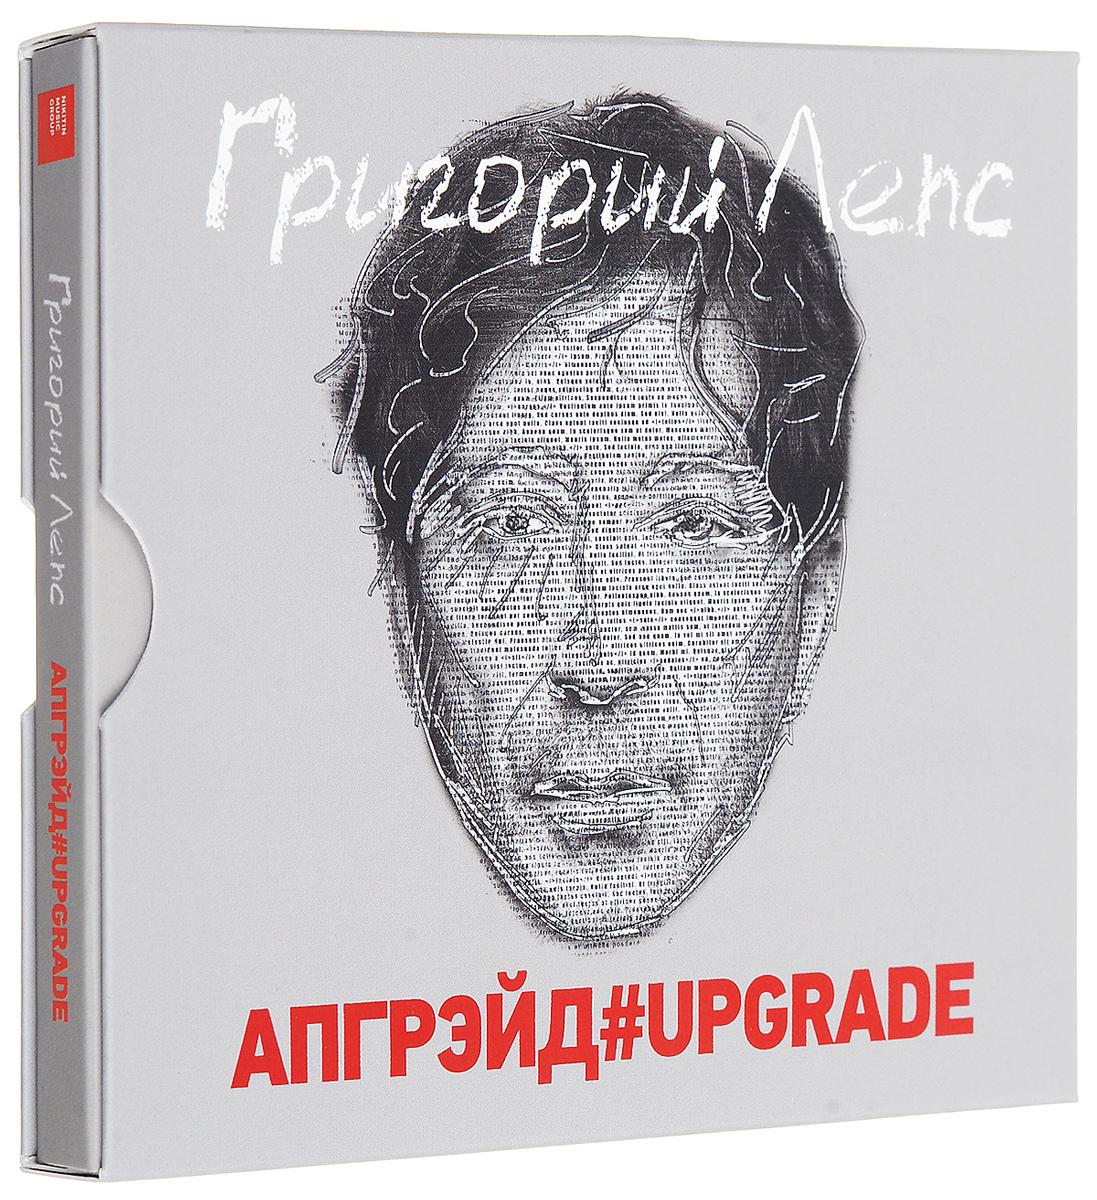 Григорий Лепс Григорий Лепс. Апгрэйд#Upgrade (2 CD) григорий лепс полный вперед lp